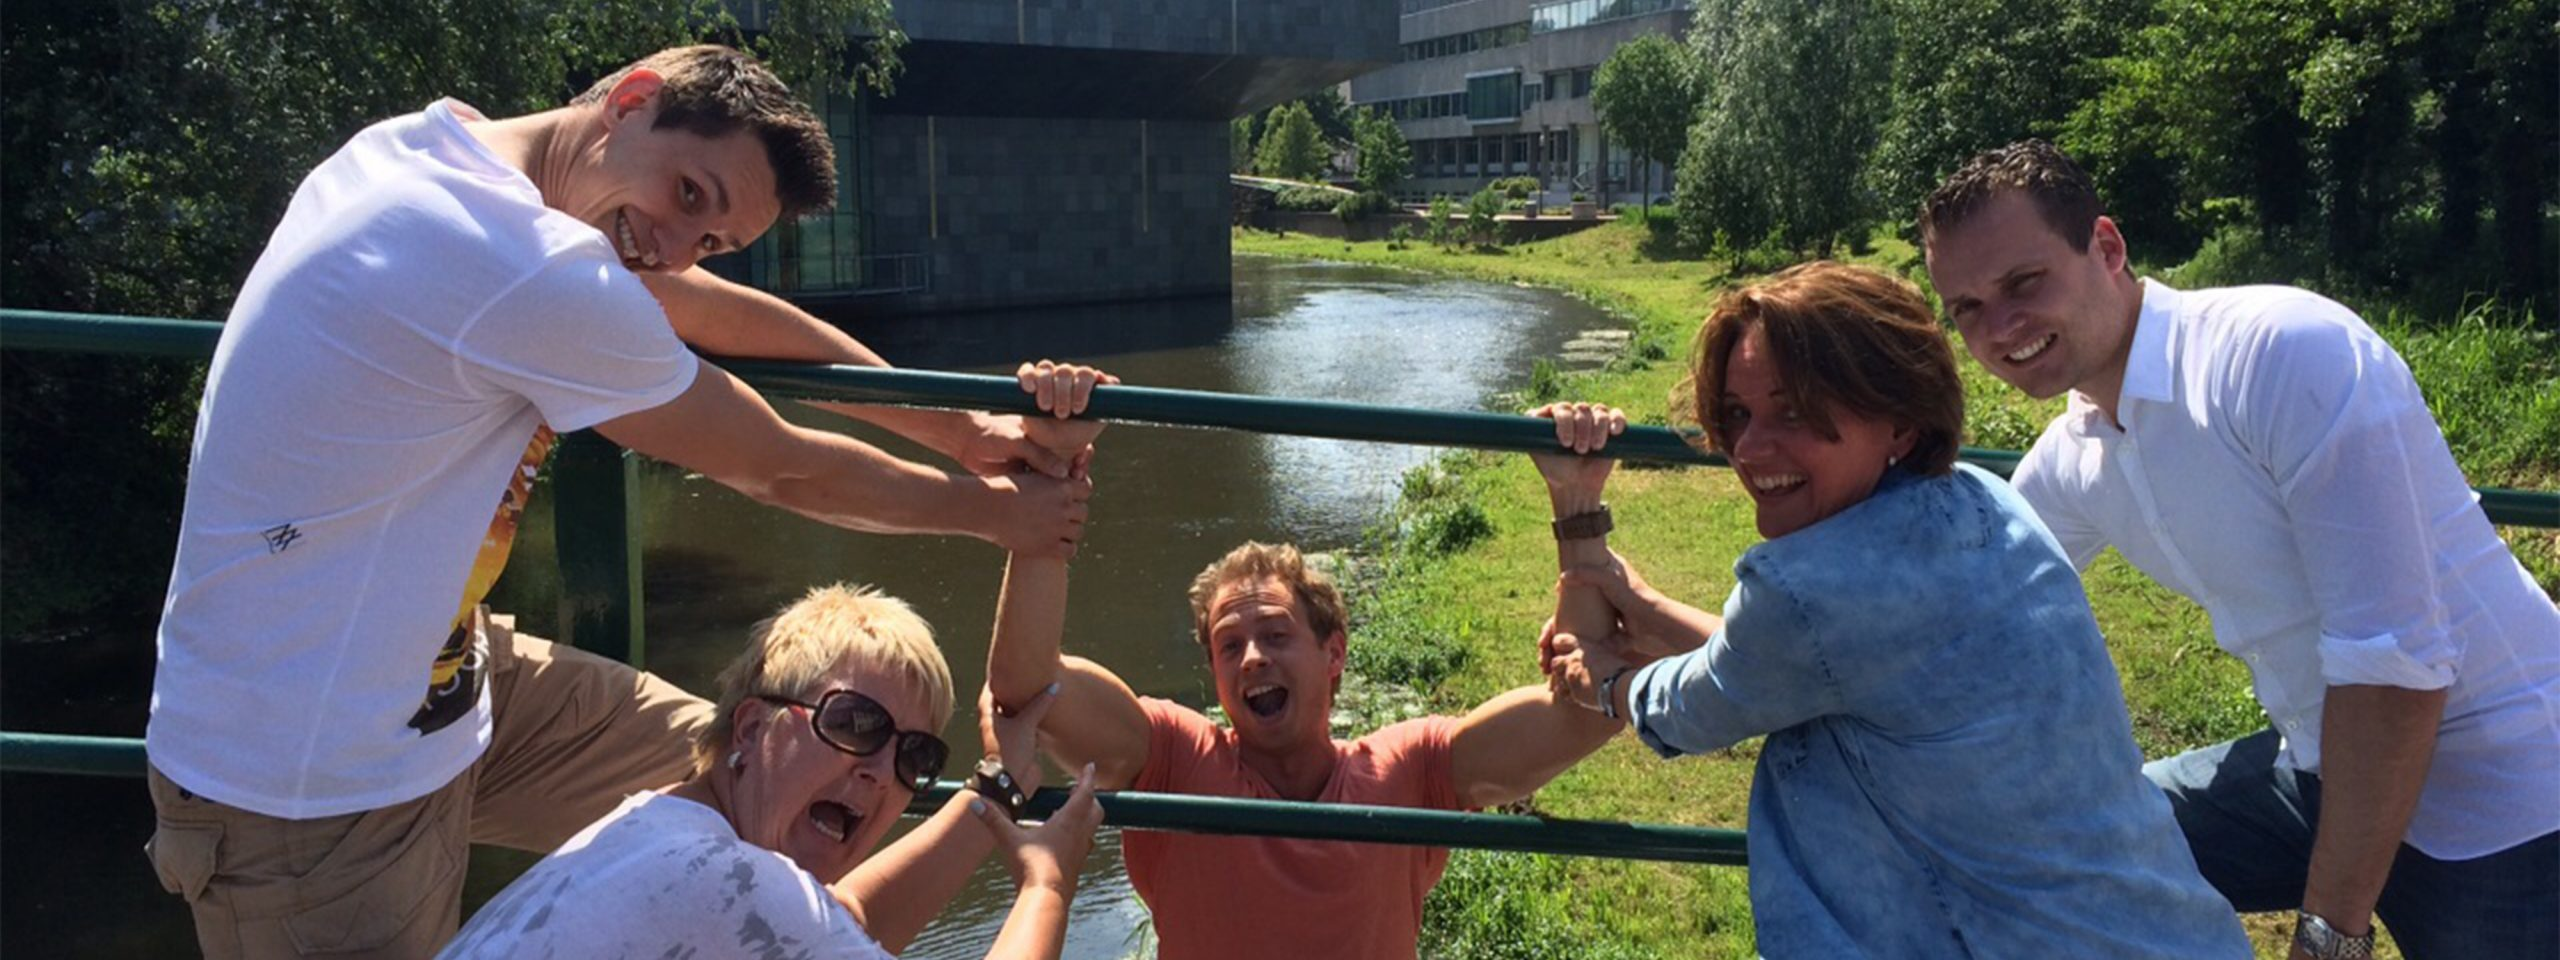 citygame-eindhoven-teambuilding